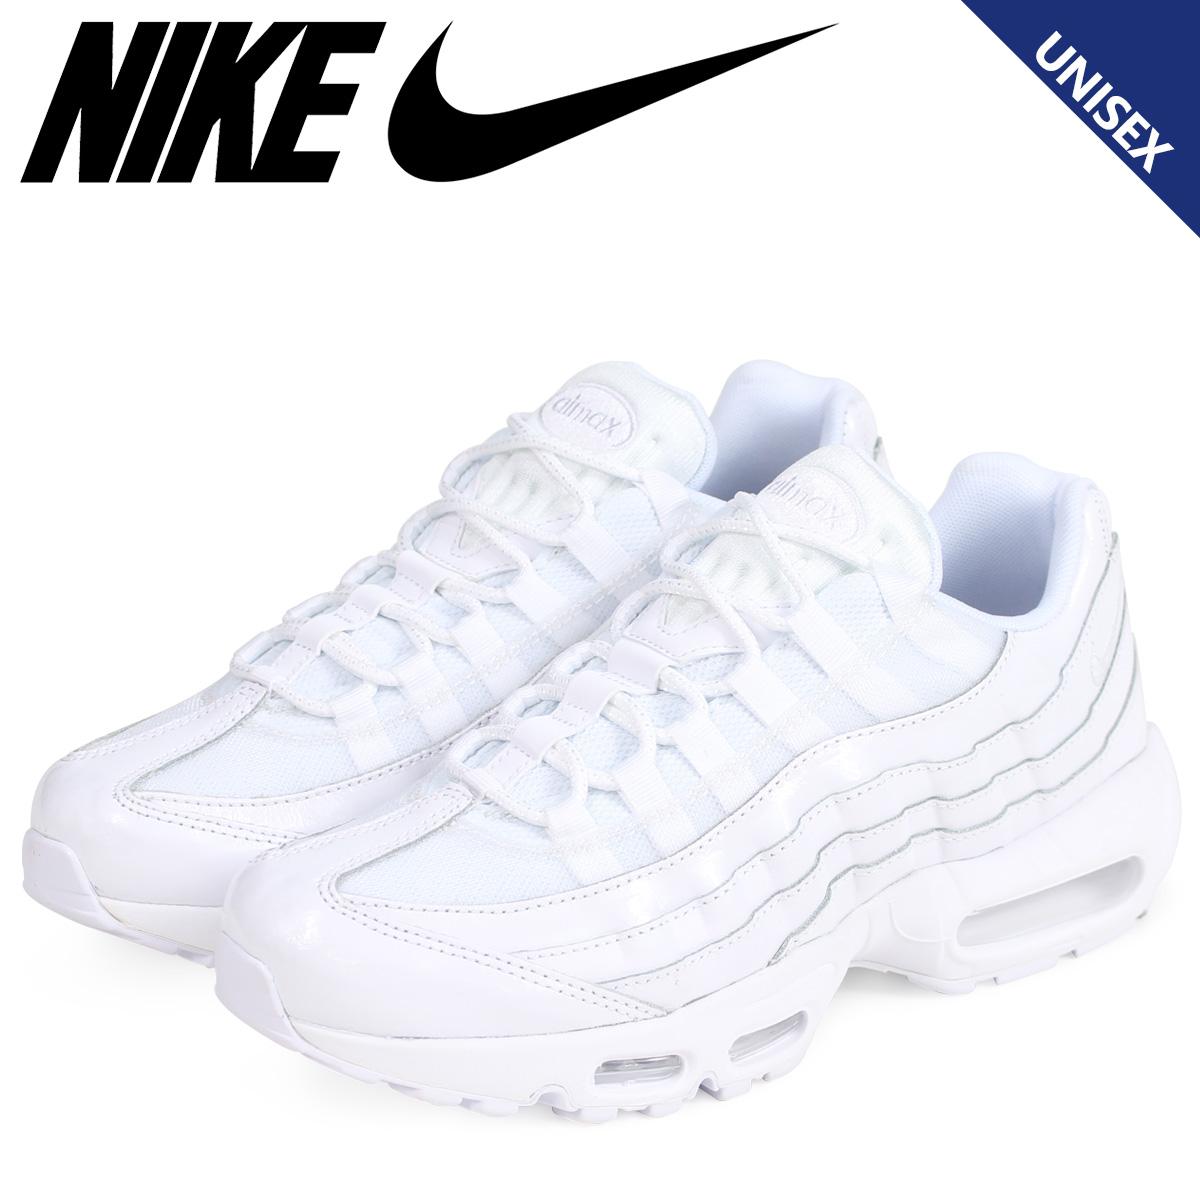 b44f6812a4 Sugar Online Shop: NIKE Kie Ney AMAX 95 sneakers men WMNS AIR MAX 95 ...